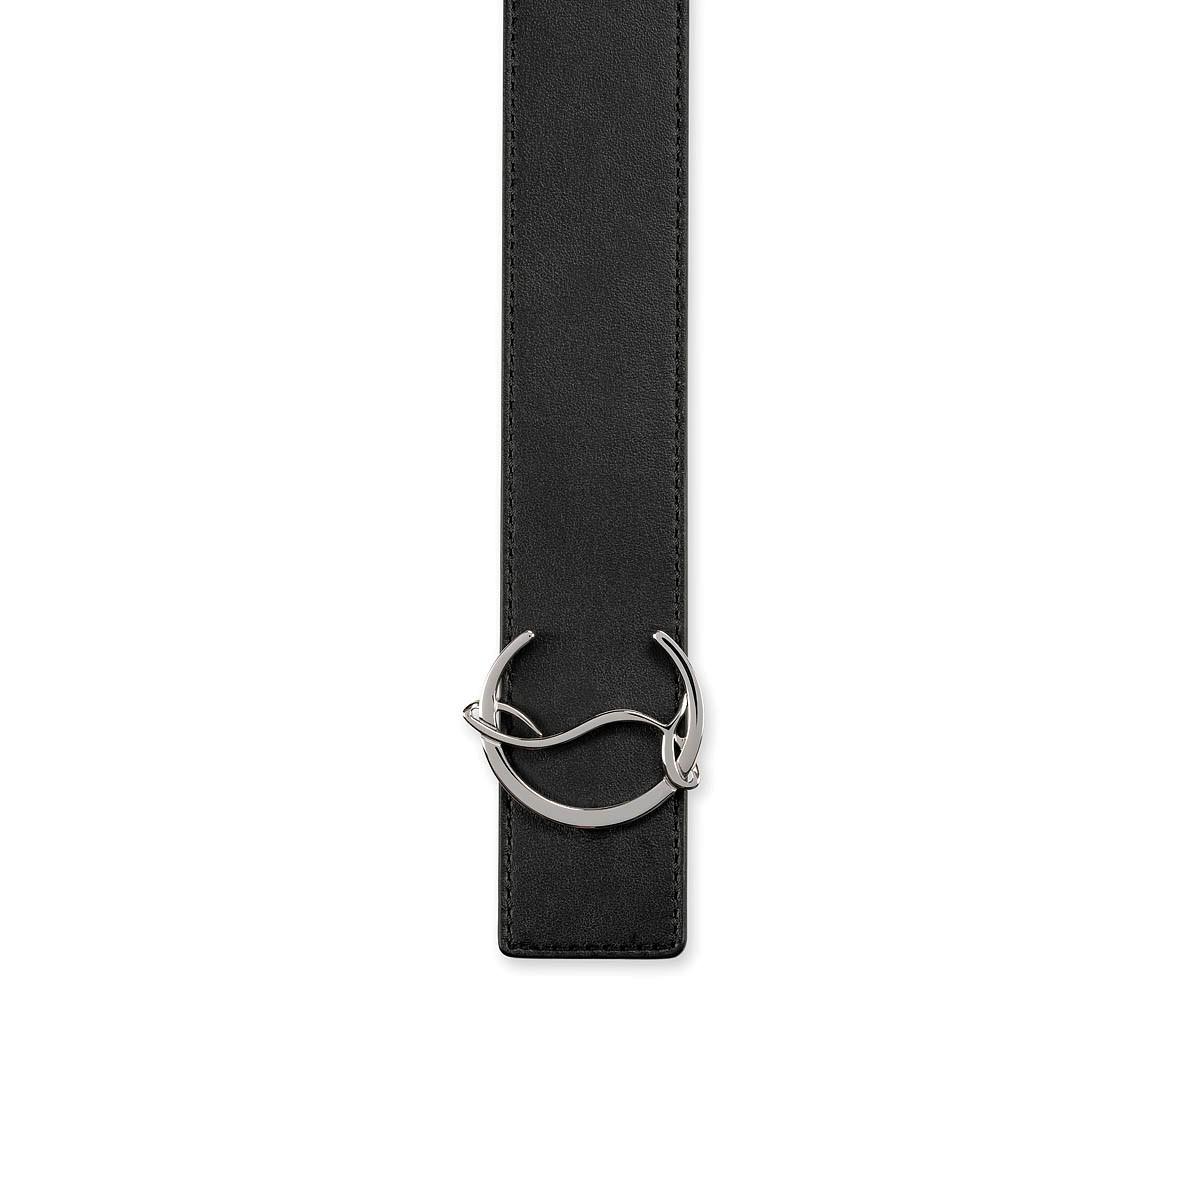 Belt - Ceinture Logo Cl - Christian Louboutin